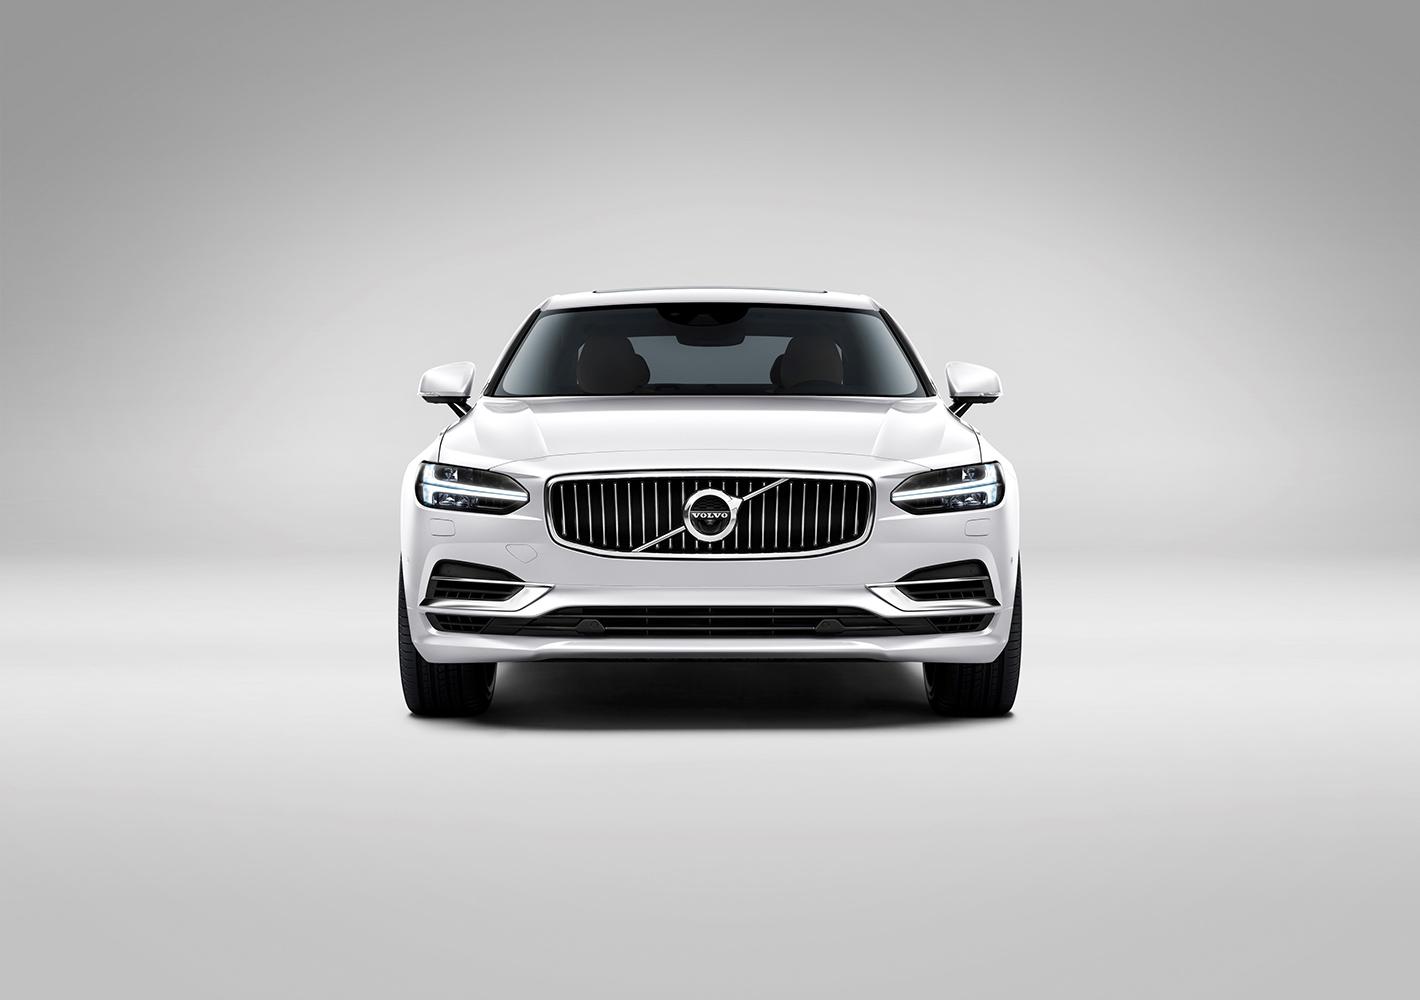 170131_Front_Volvo_S90_White